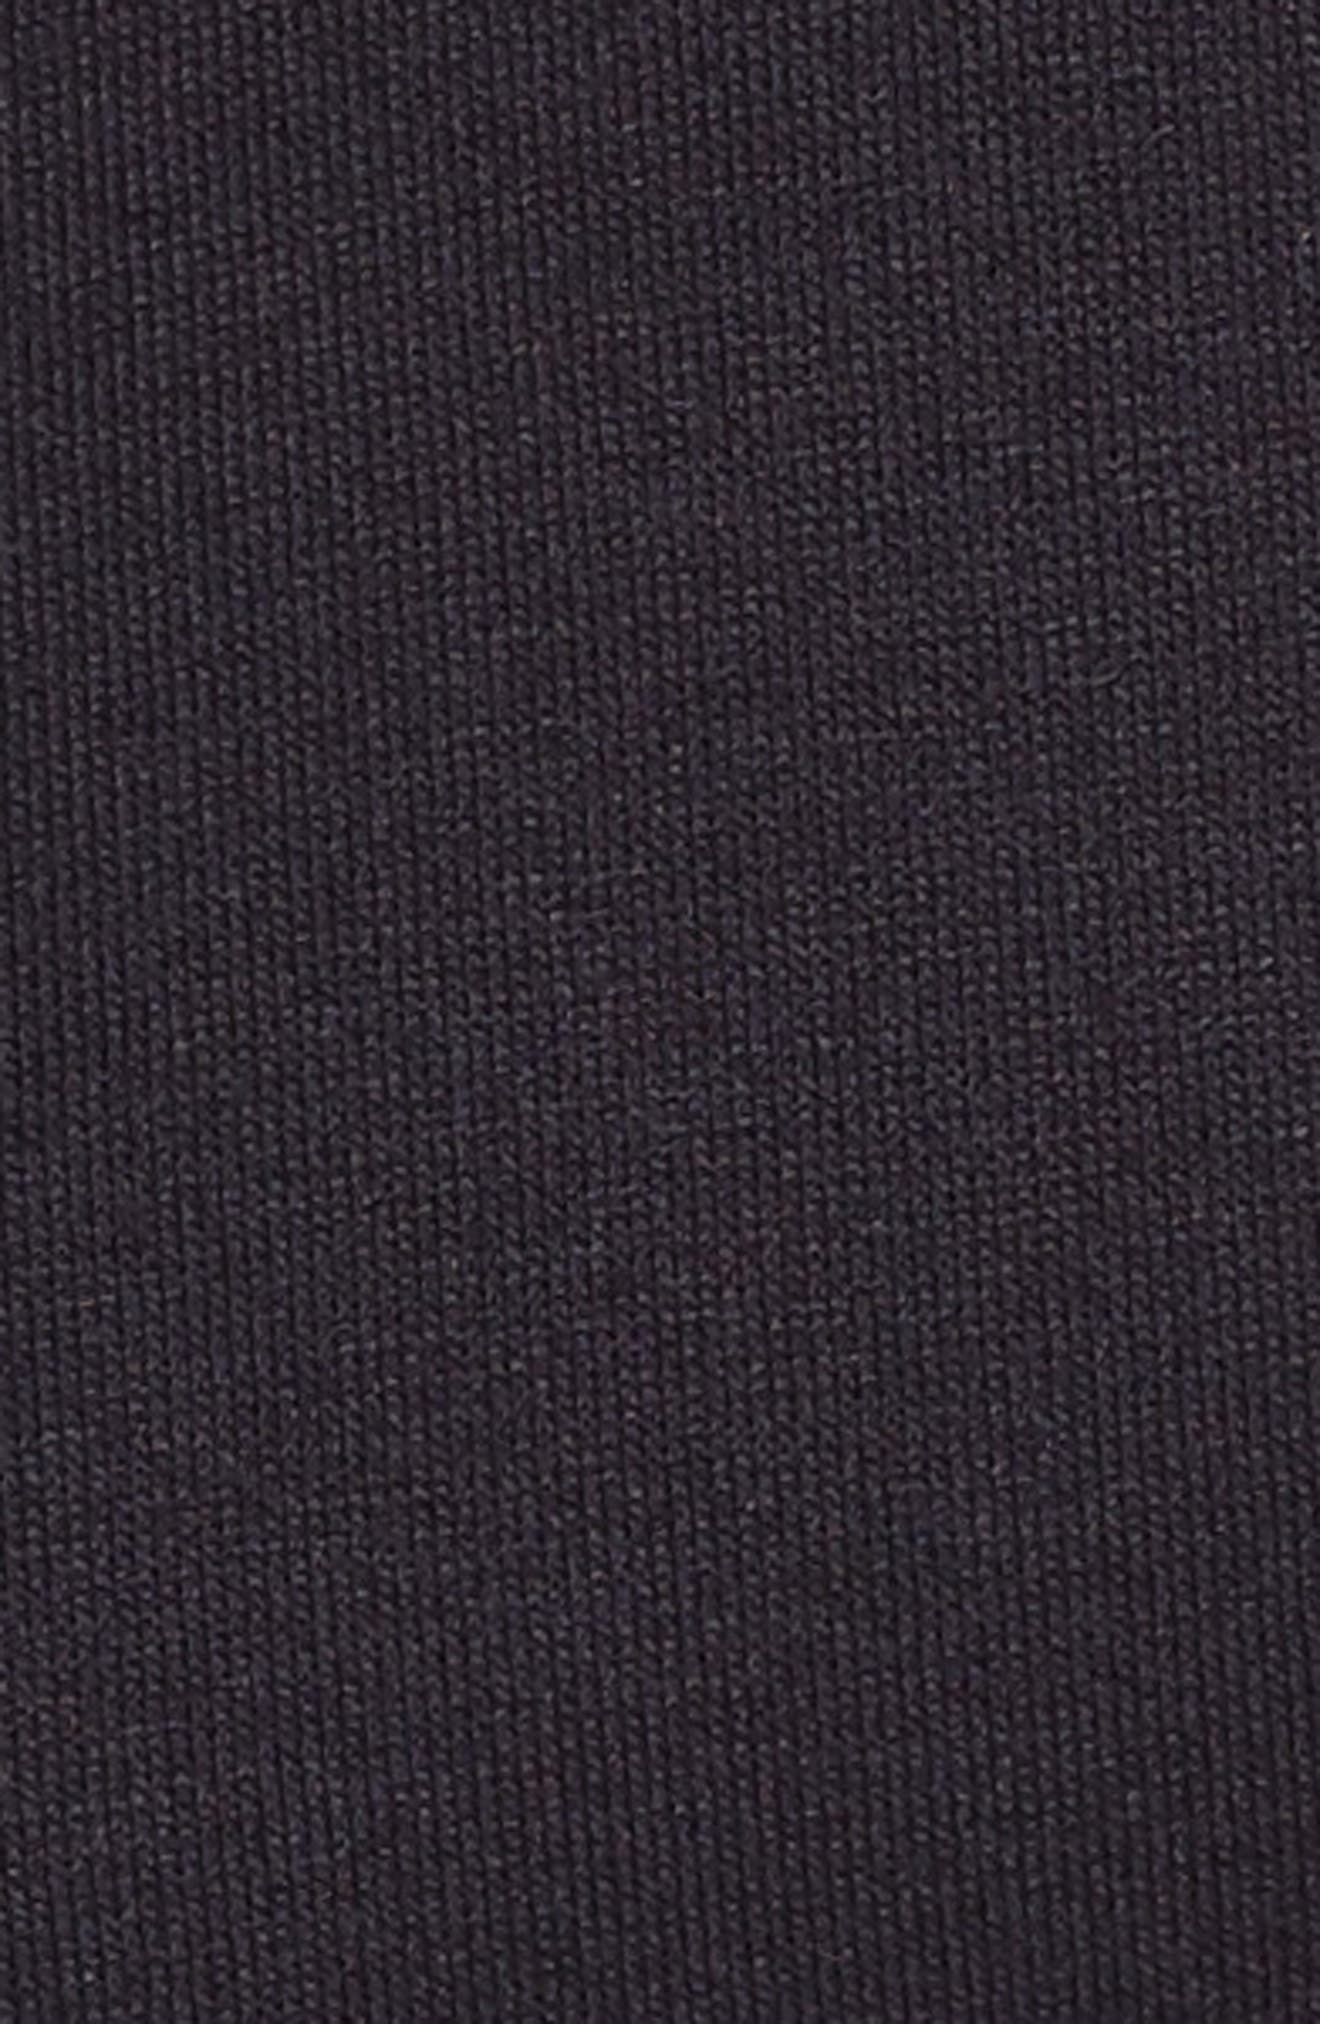 Ruffle Sleeve Jacket,                             Alternate thumbnail 7, color,                             410